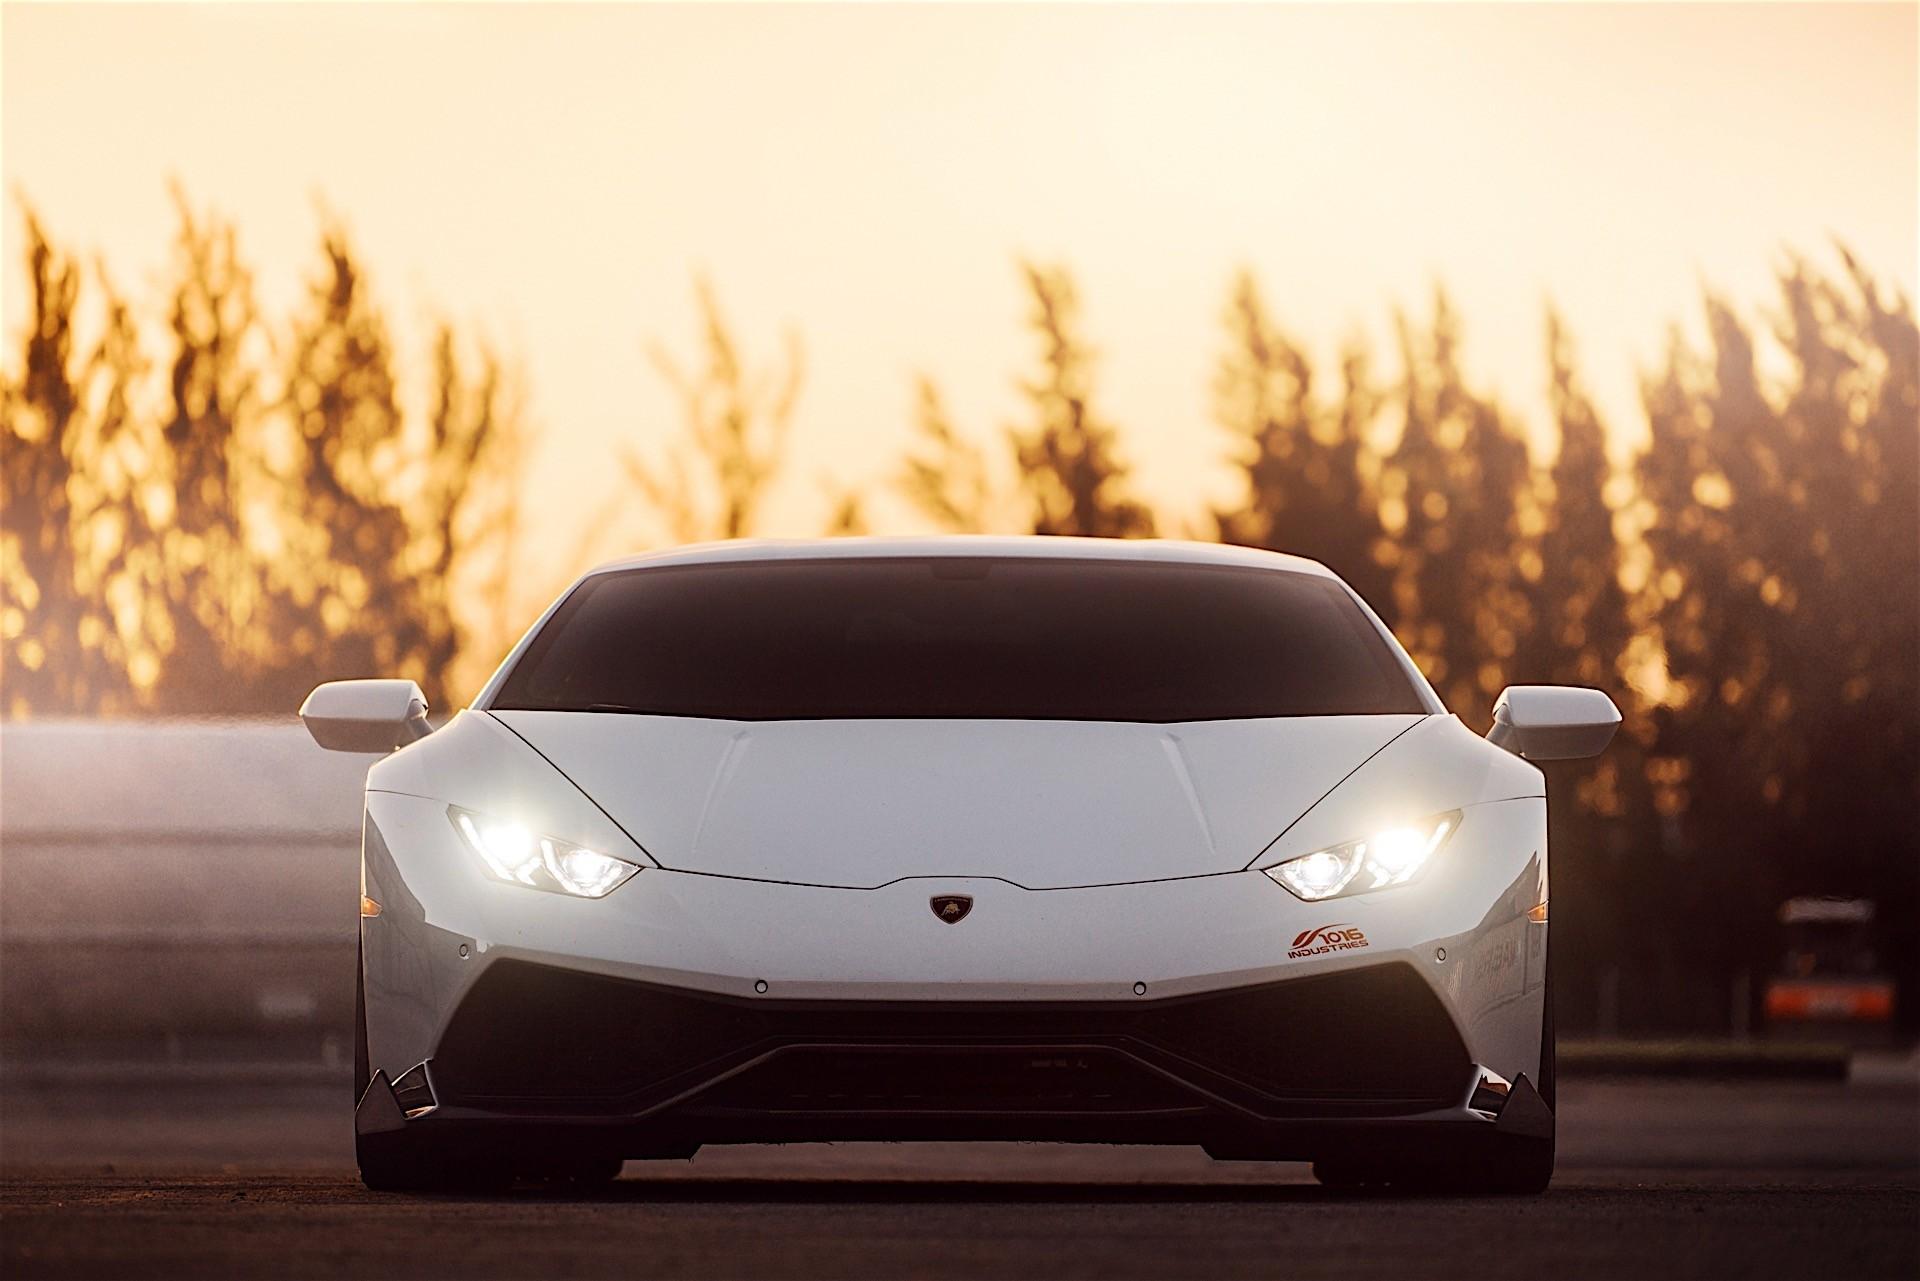 Lamborghini_Huracan_1016_Industries_05